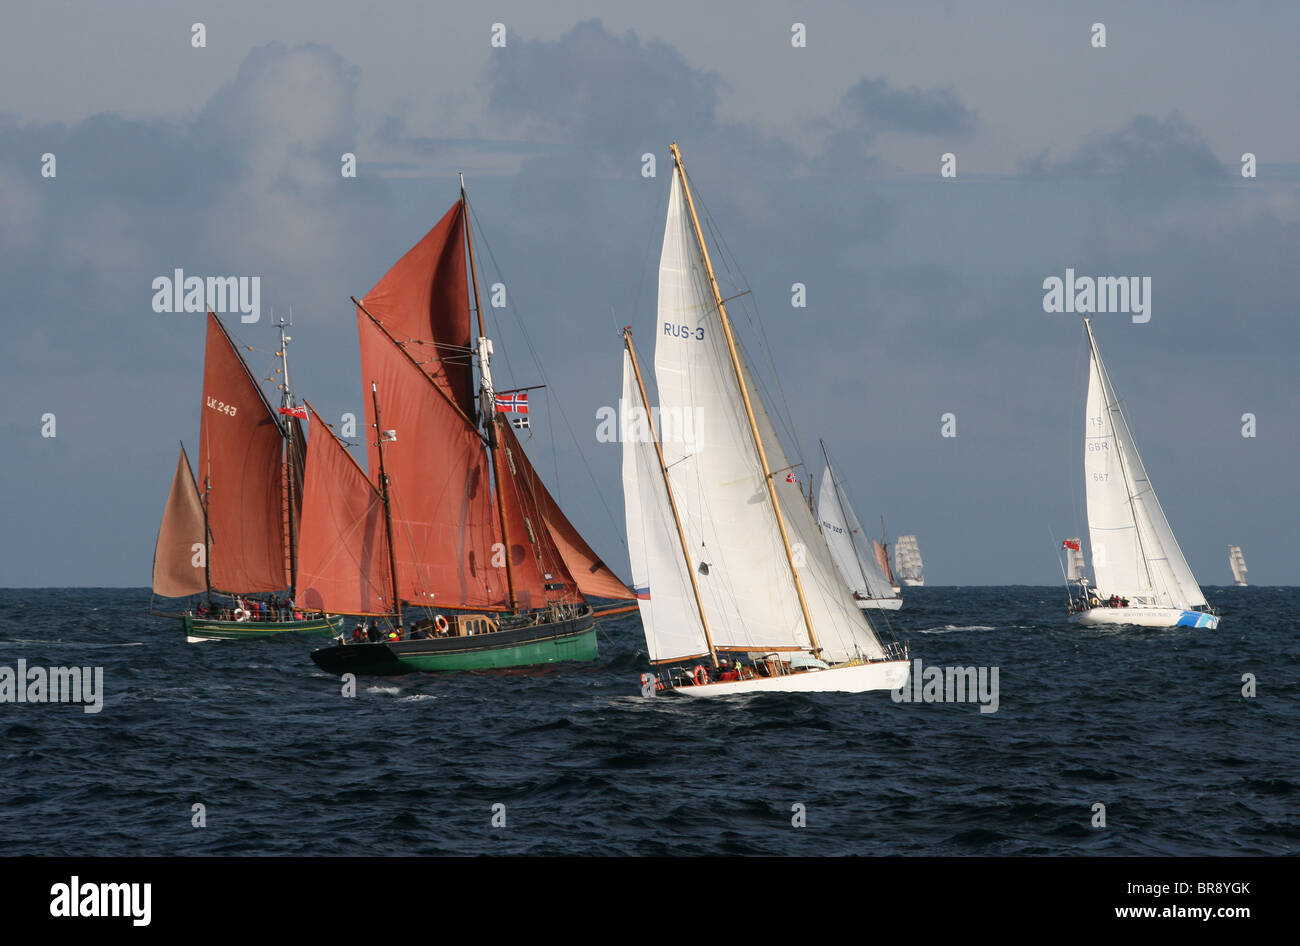 Tall Ships Races 2010, Kristiansand - Stock Image